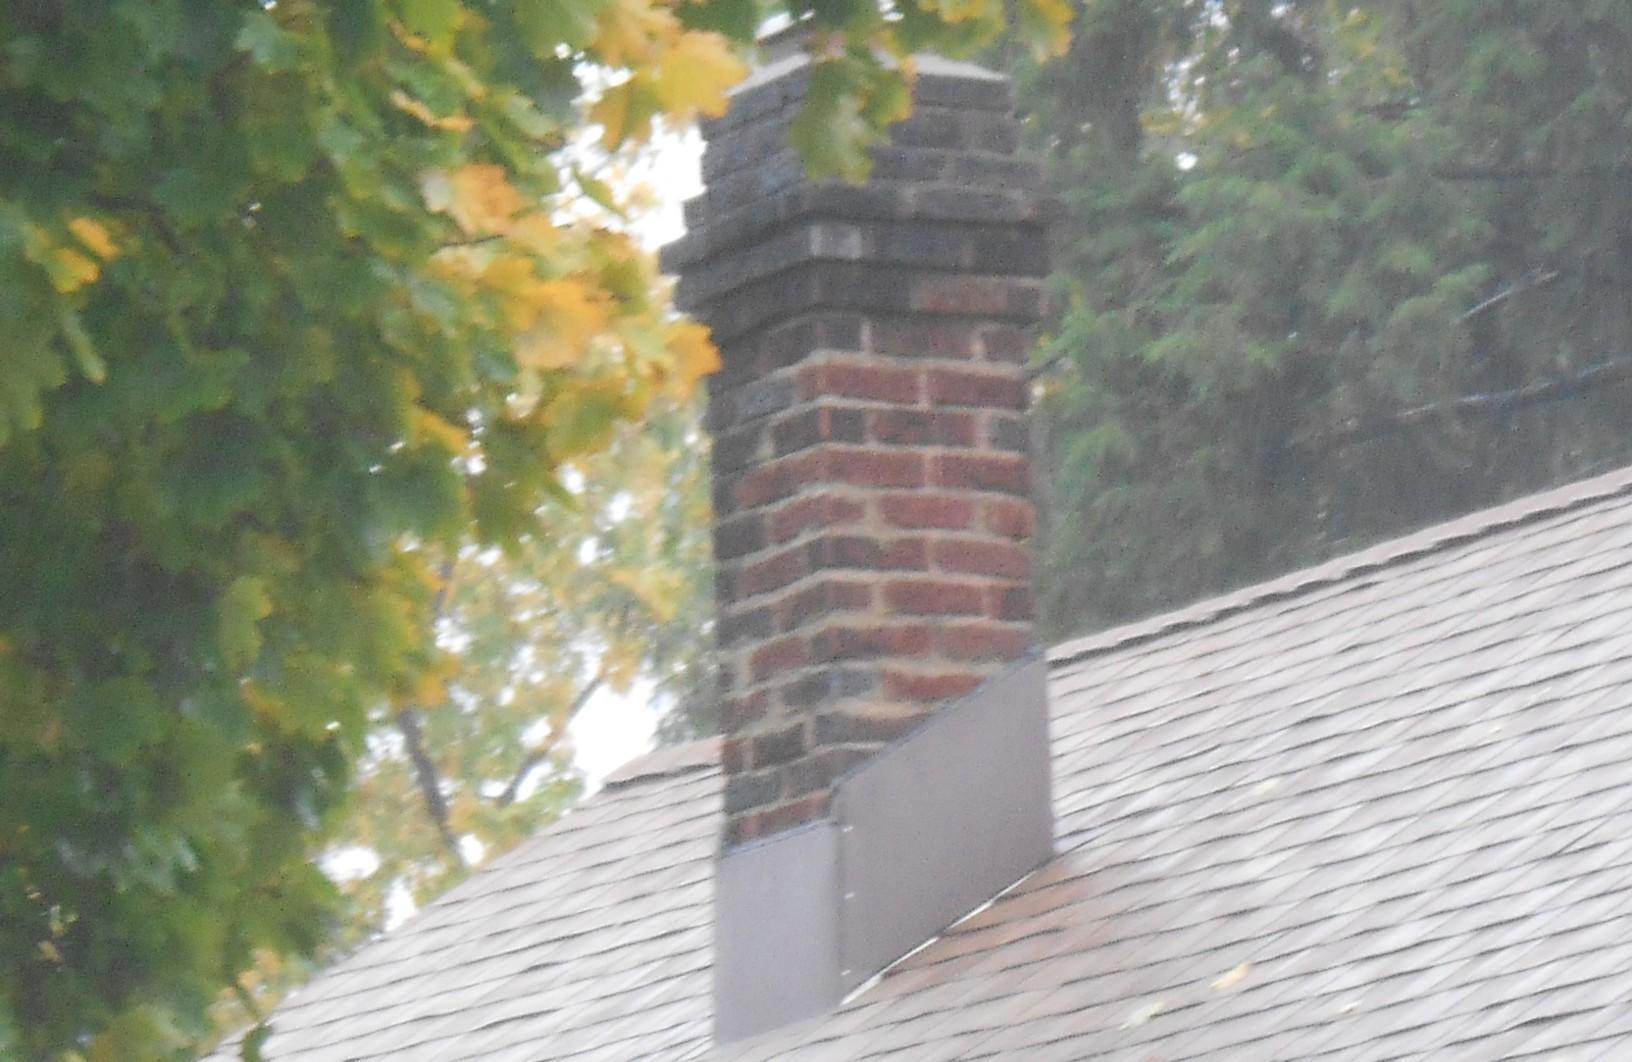 Custom Metal Flashing on Asphalt Shingle Roof Install in Croydon, PA